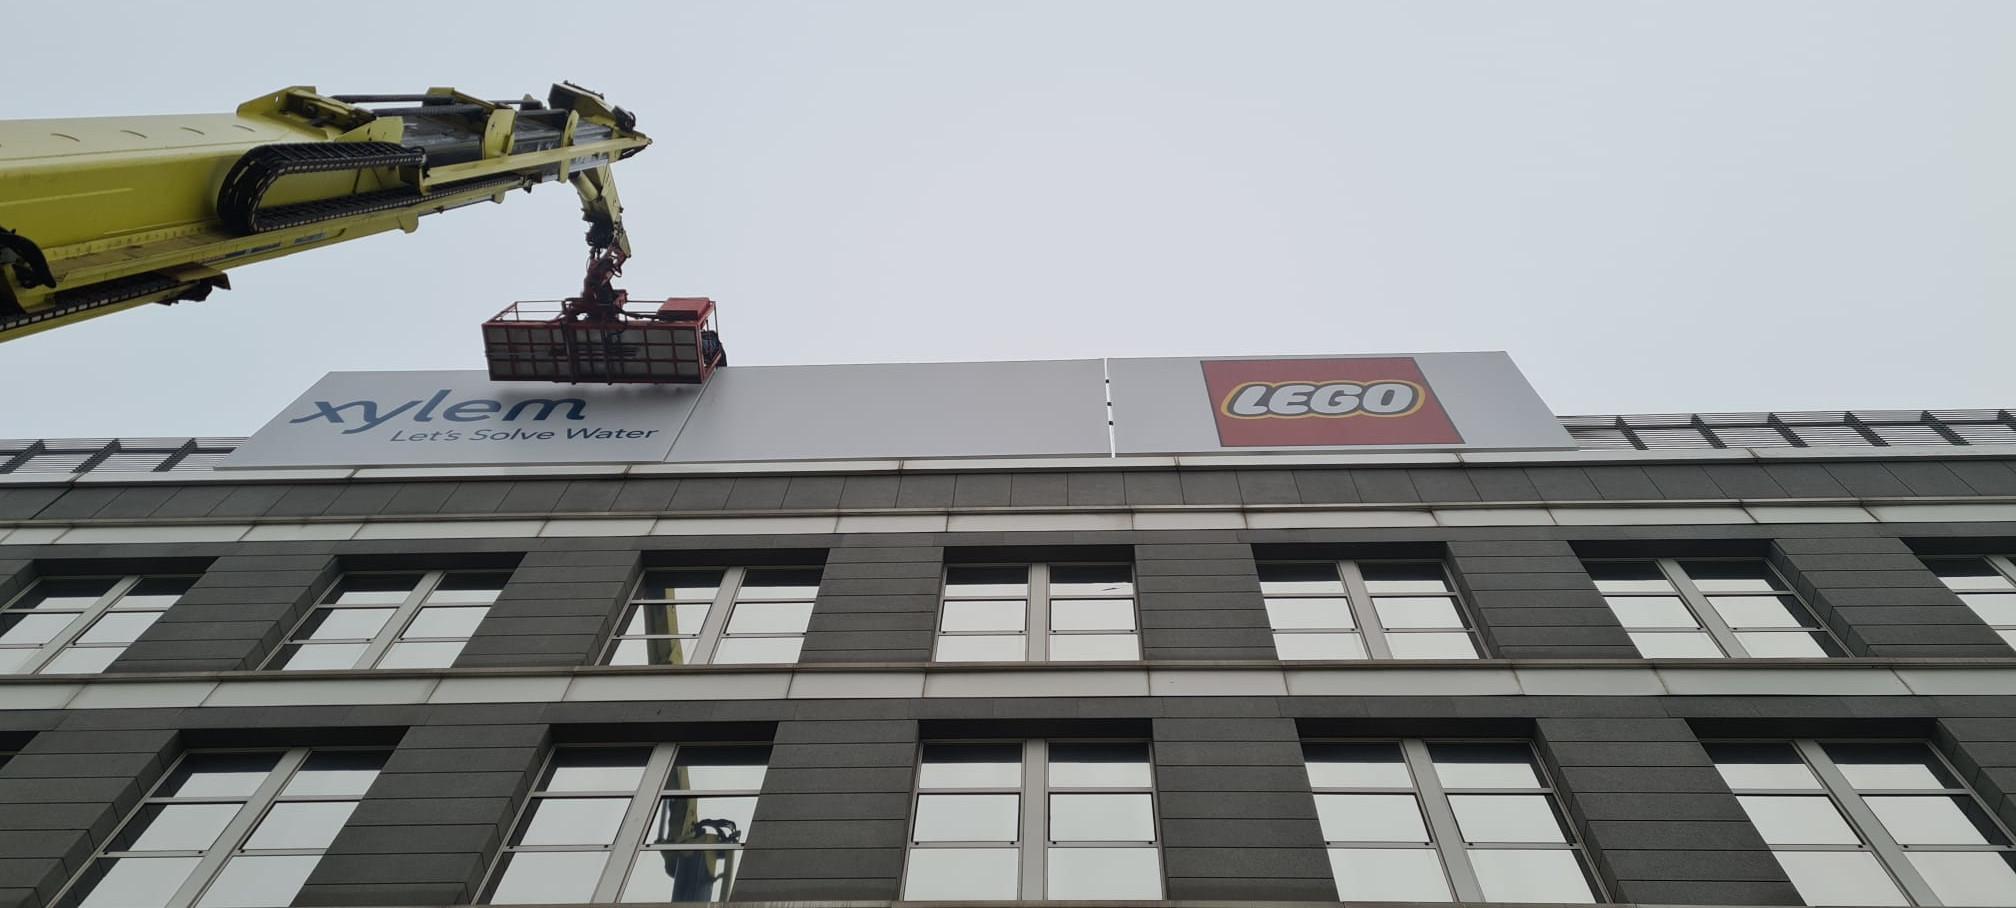 Insegna - Lego Xylem1